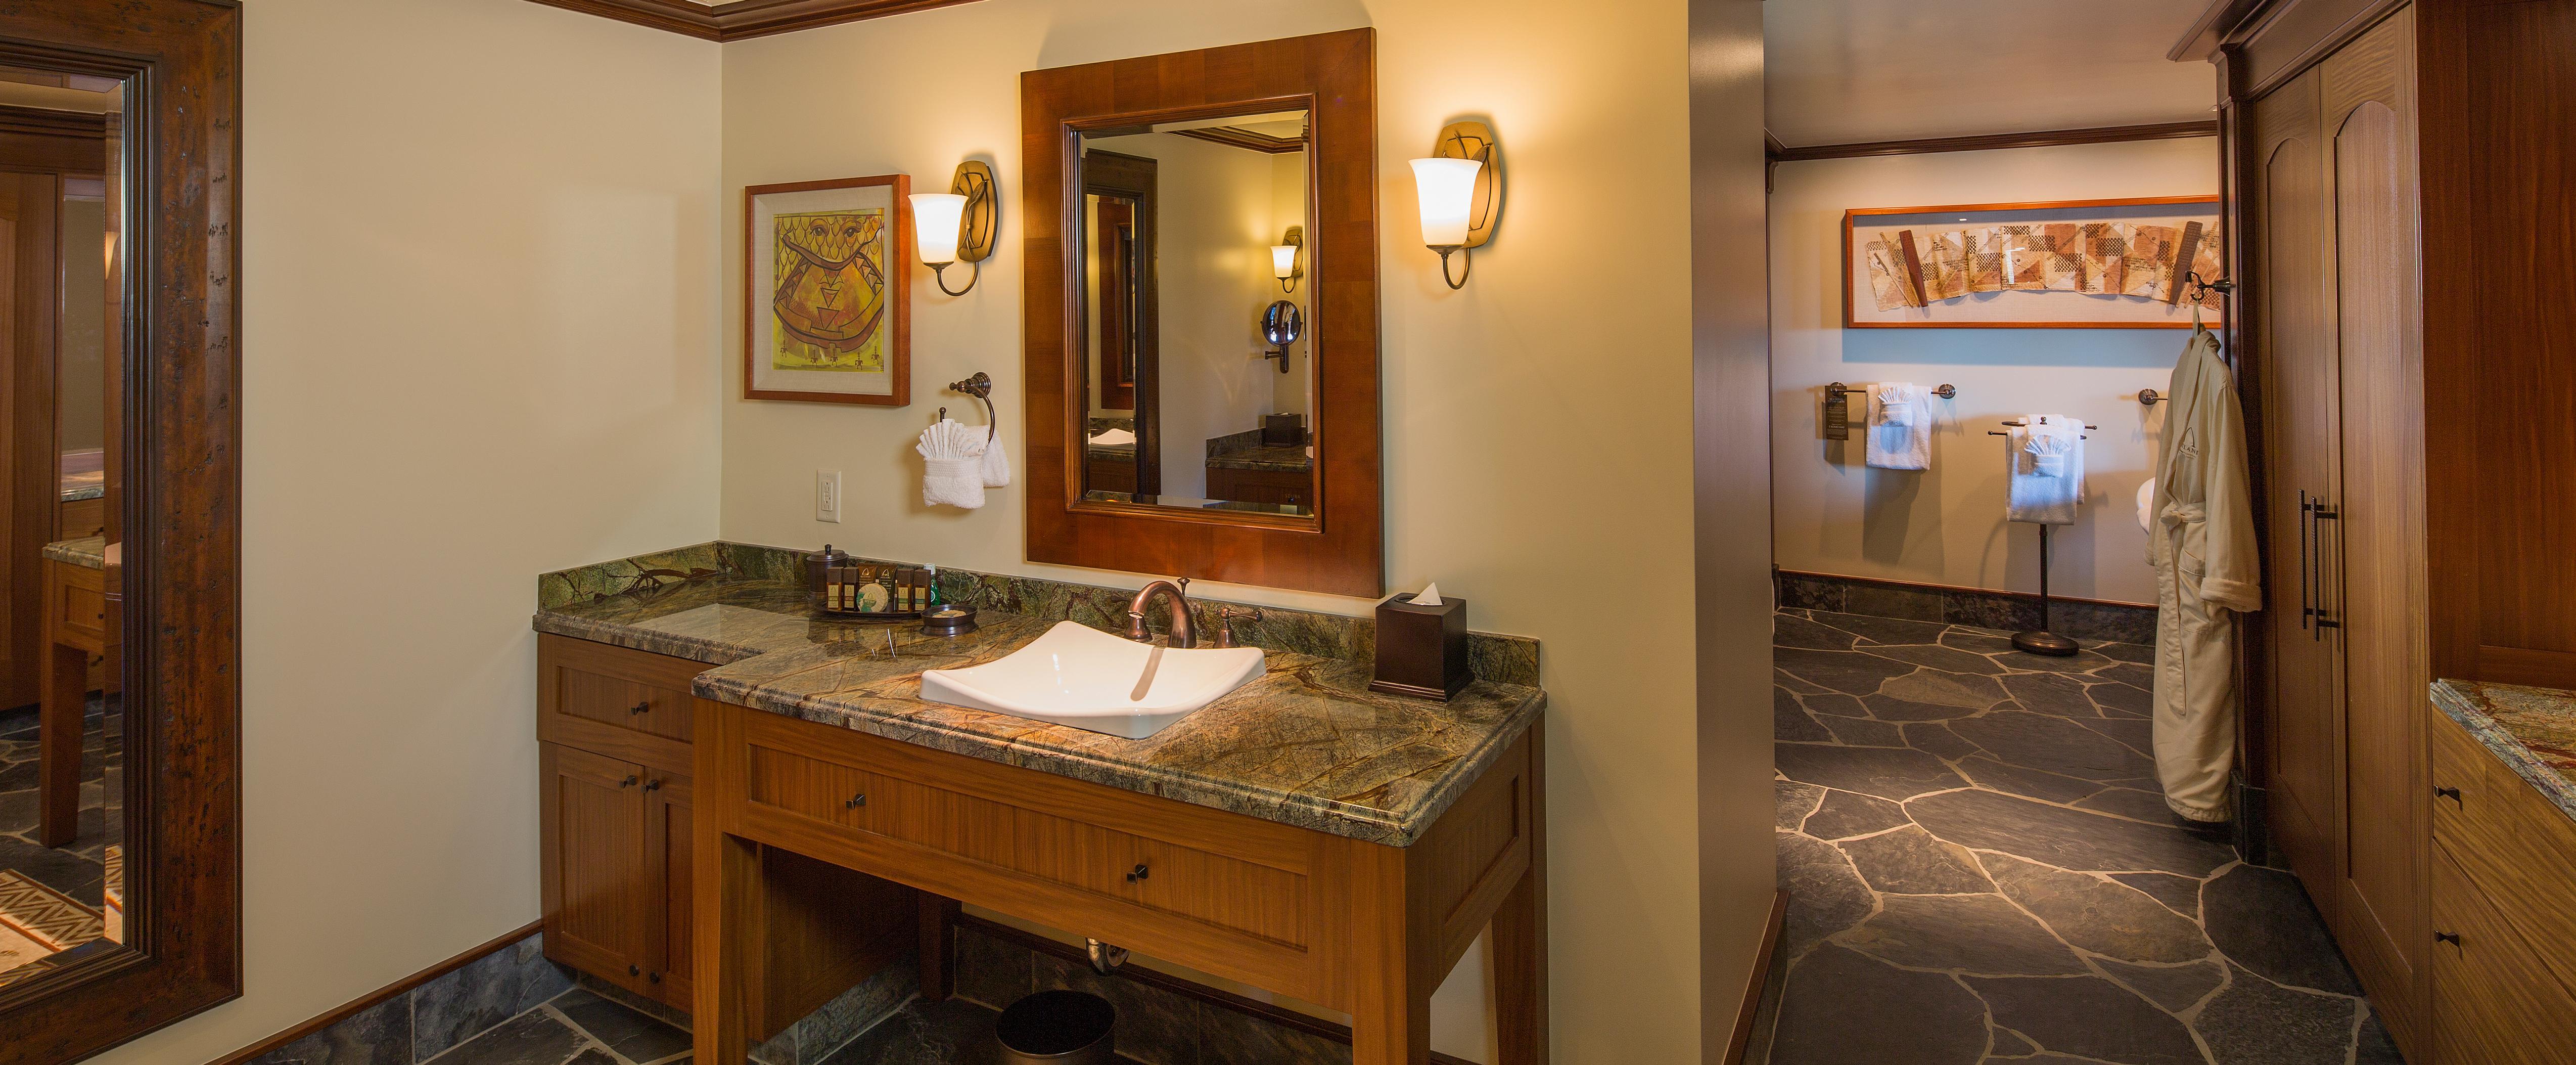 A bathroom vanity in the 2-Bedroom Villa at Aulani